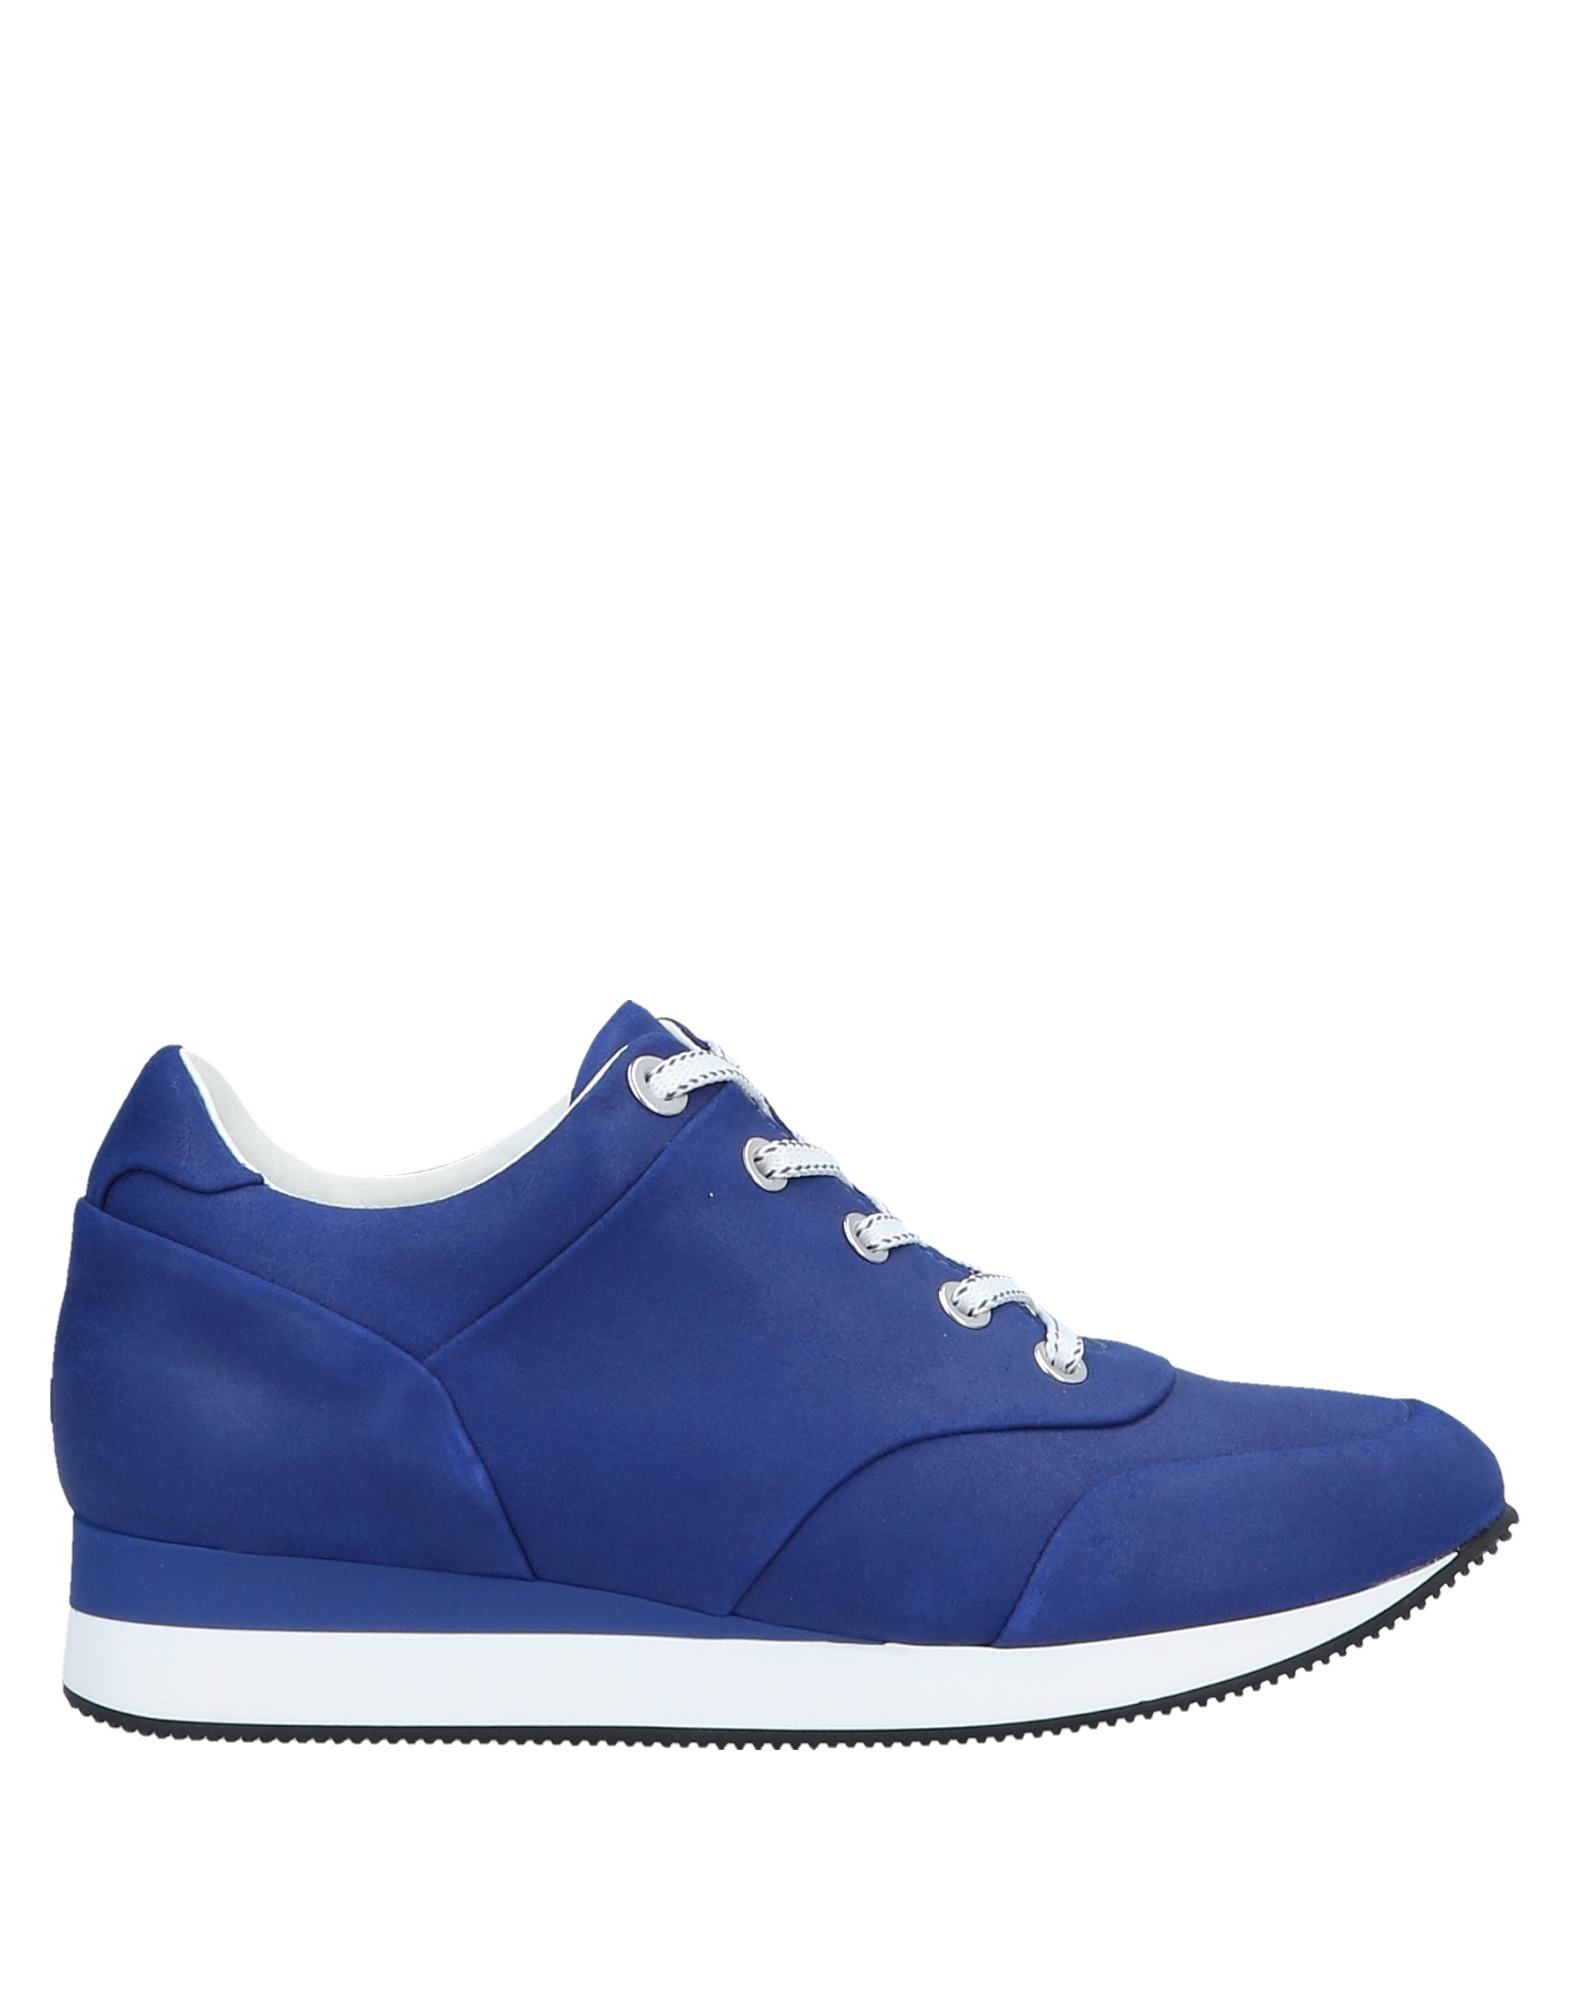 Max Mara Sneakers - Women Max Mara Sneakers online 11572209BJ on  Australia - 11572209BJ online c6419a